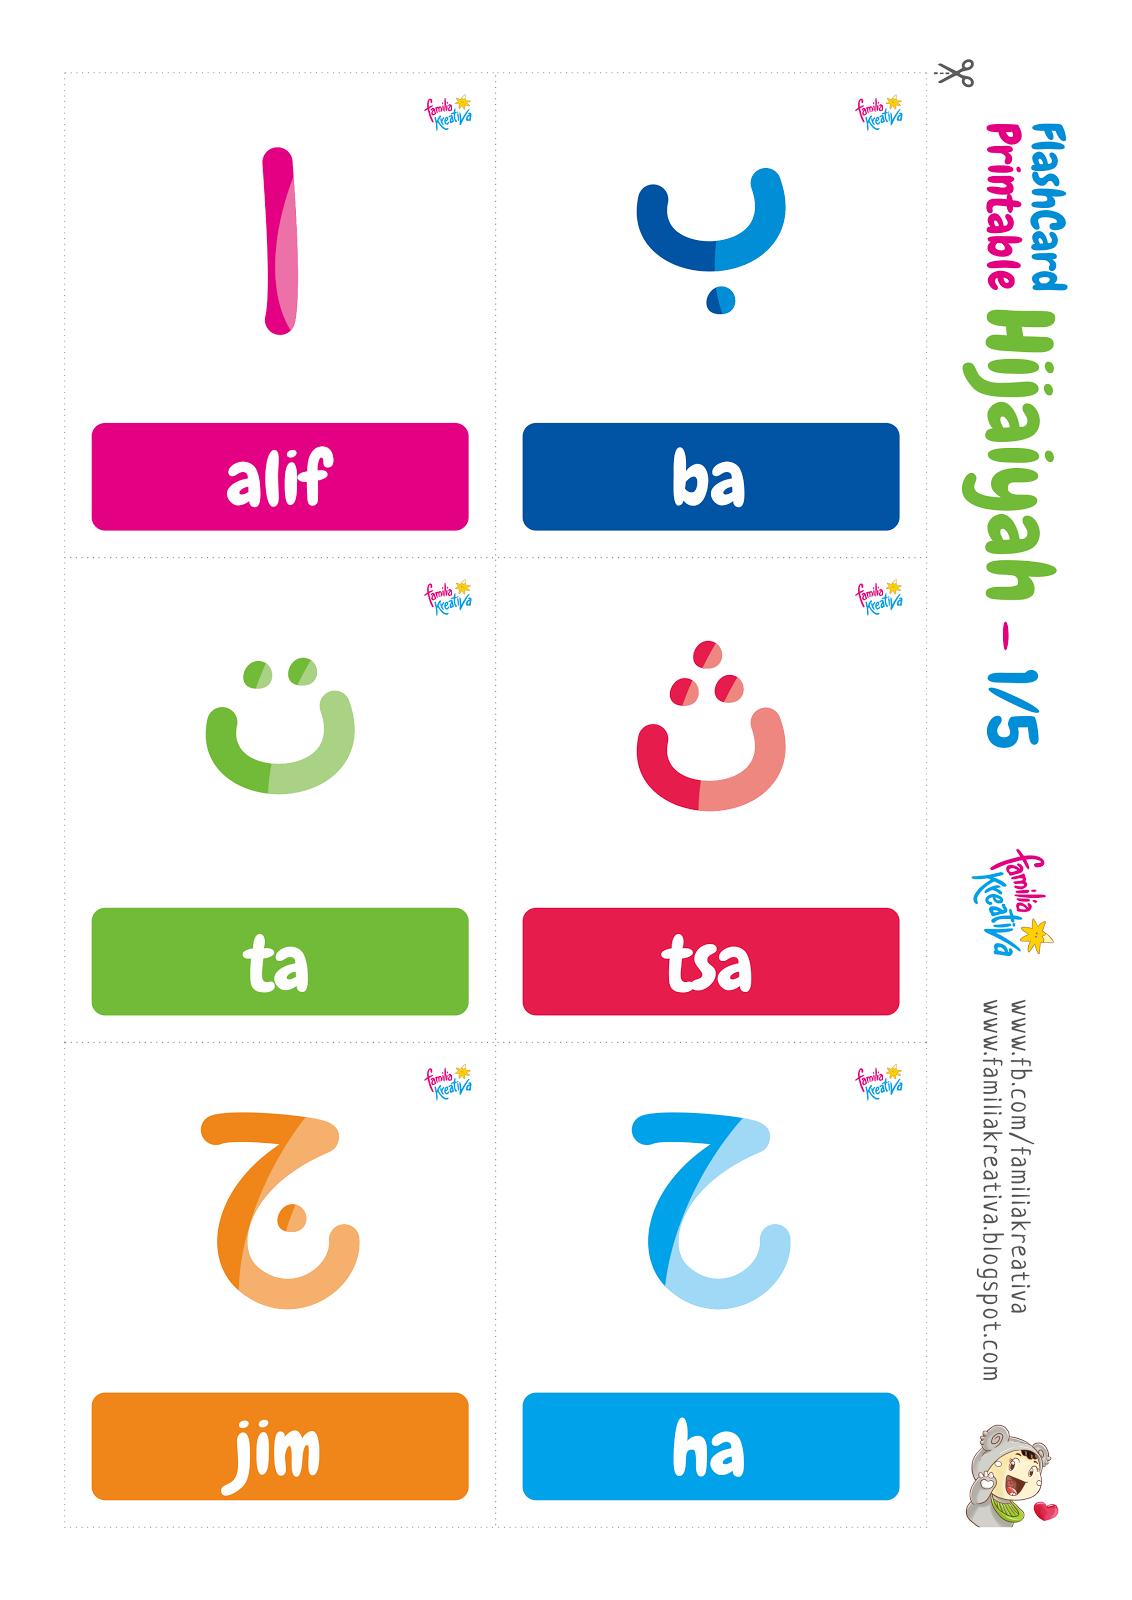 Belajar Huruf Hijaiyah - Tulisan Arab, Latin & Cara